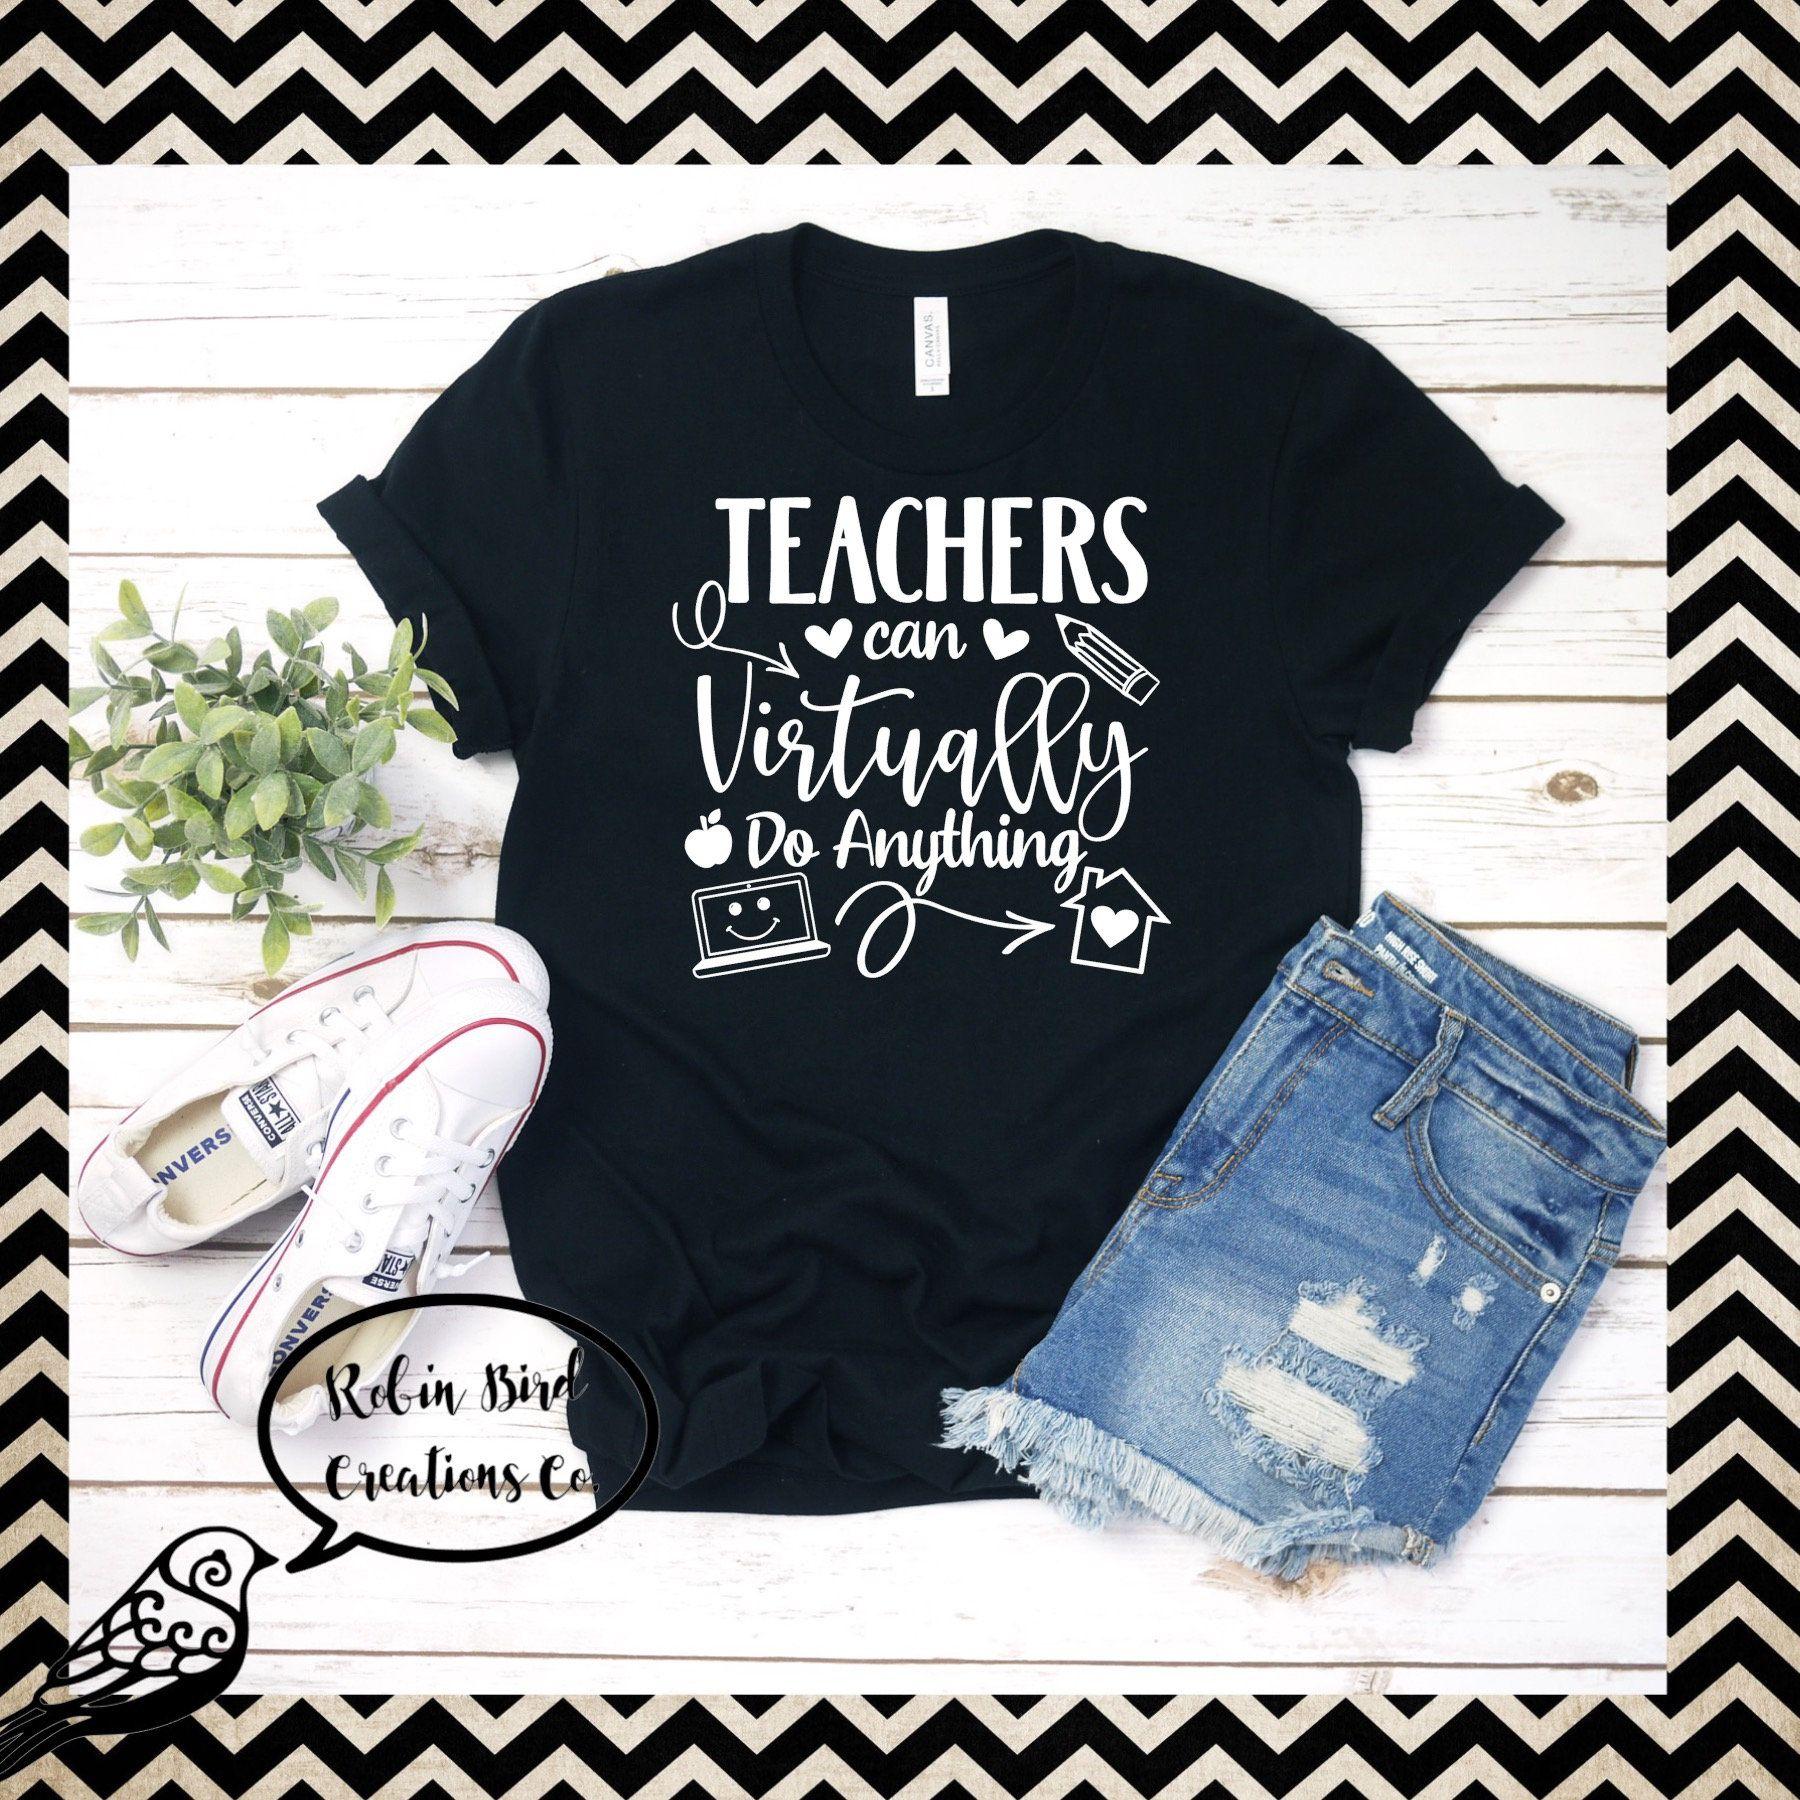 Pin On Teacher Shirts